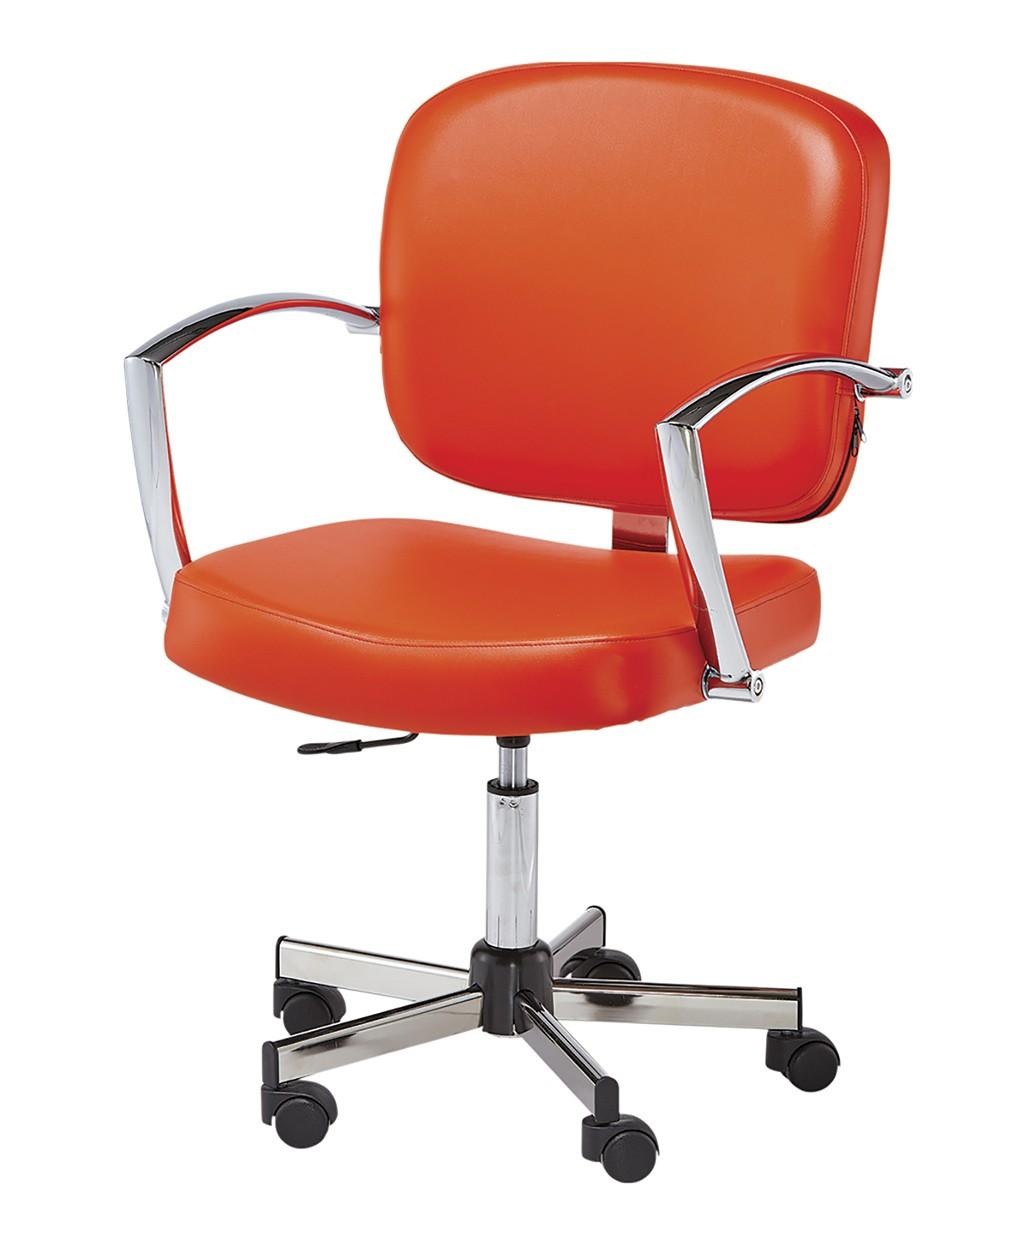 Pibbs 3792 Pisa Desk Chair